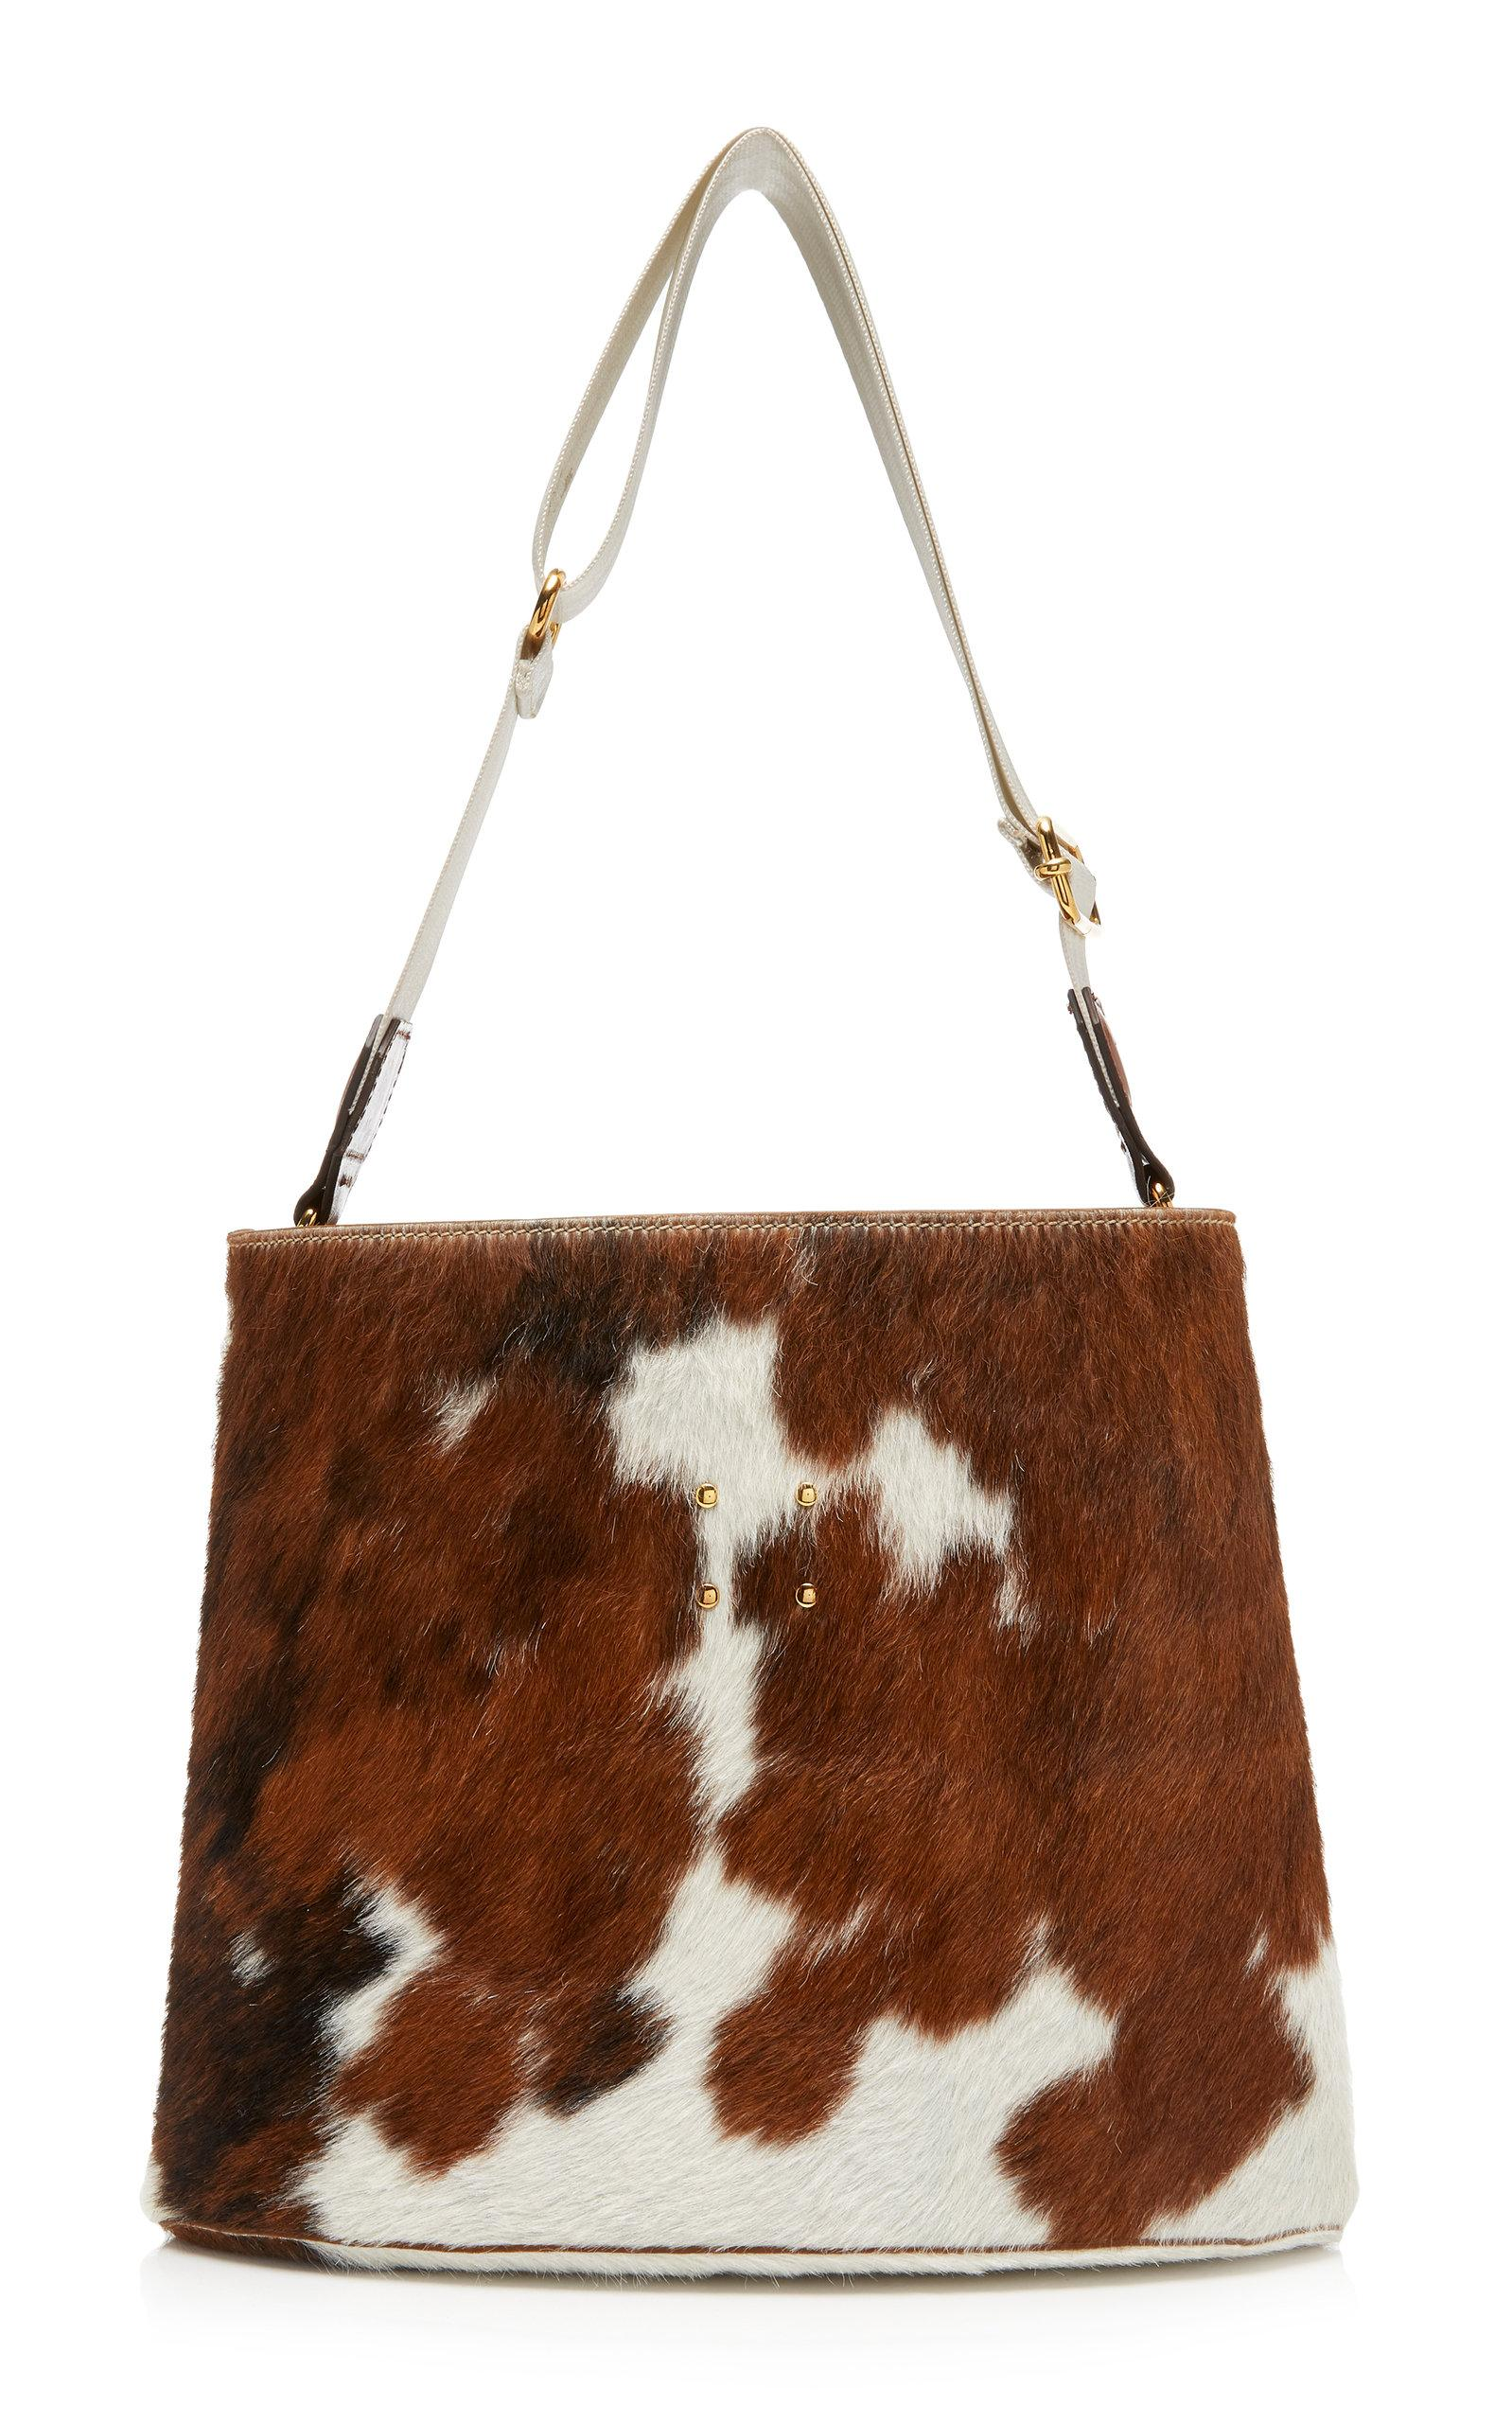 Trademark Sybil Bag In Neutral